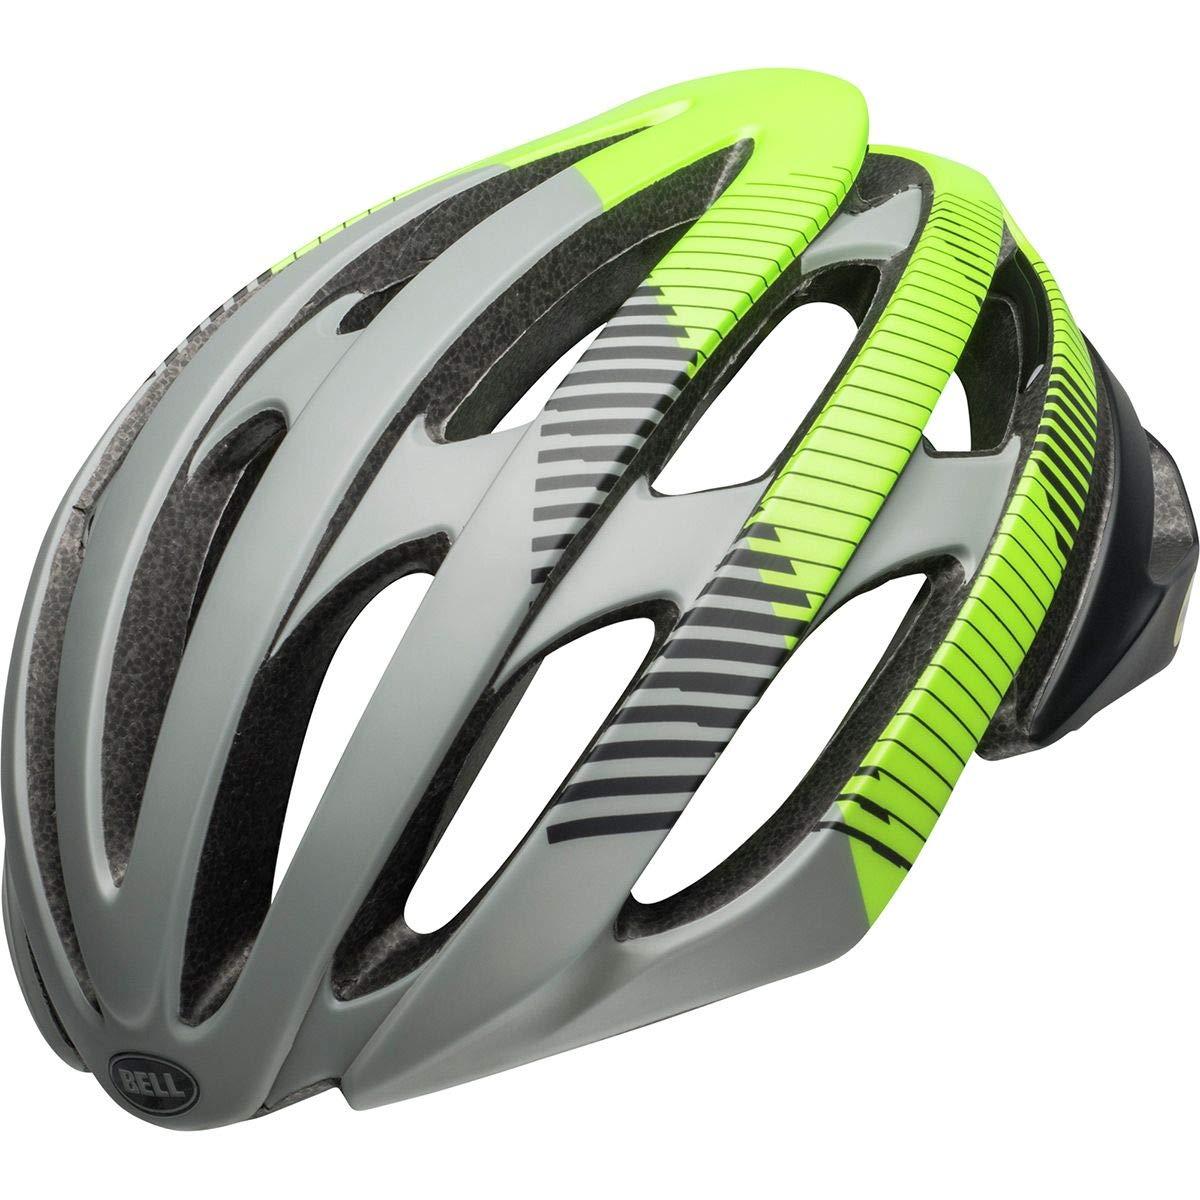 Bell Stratus MIPS Cycling Helmet - Bluster Matte Gray/Black/Green Small